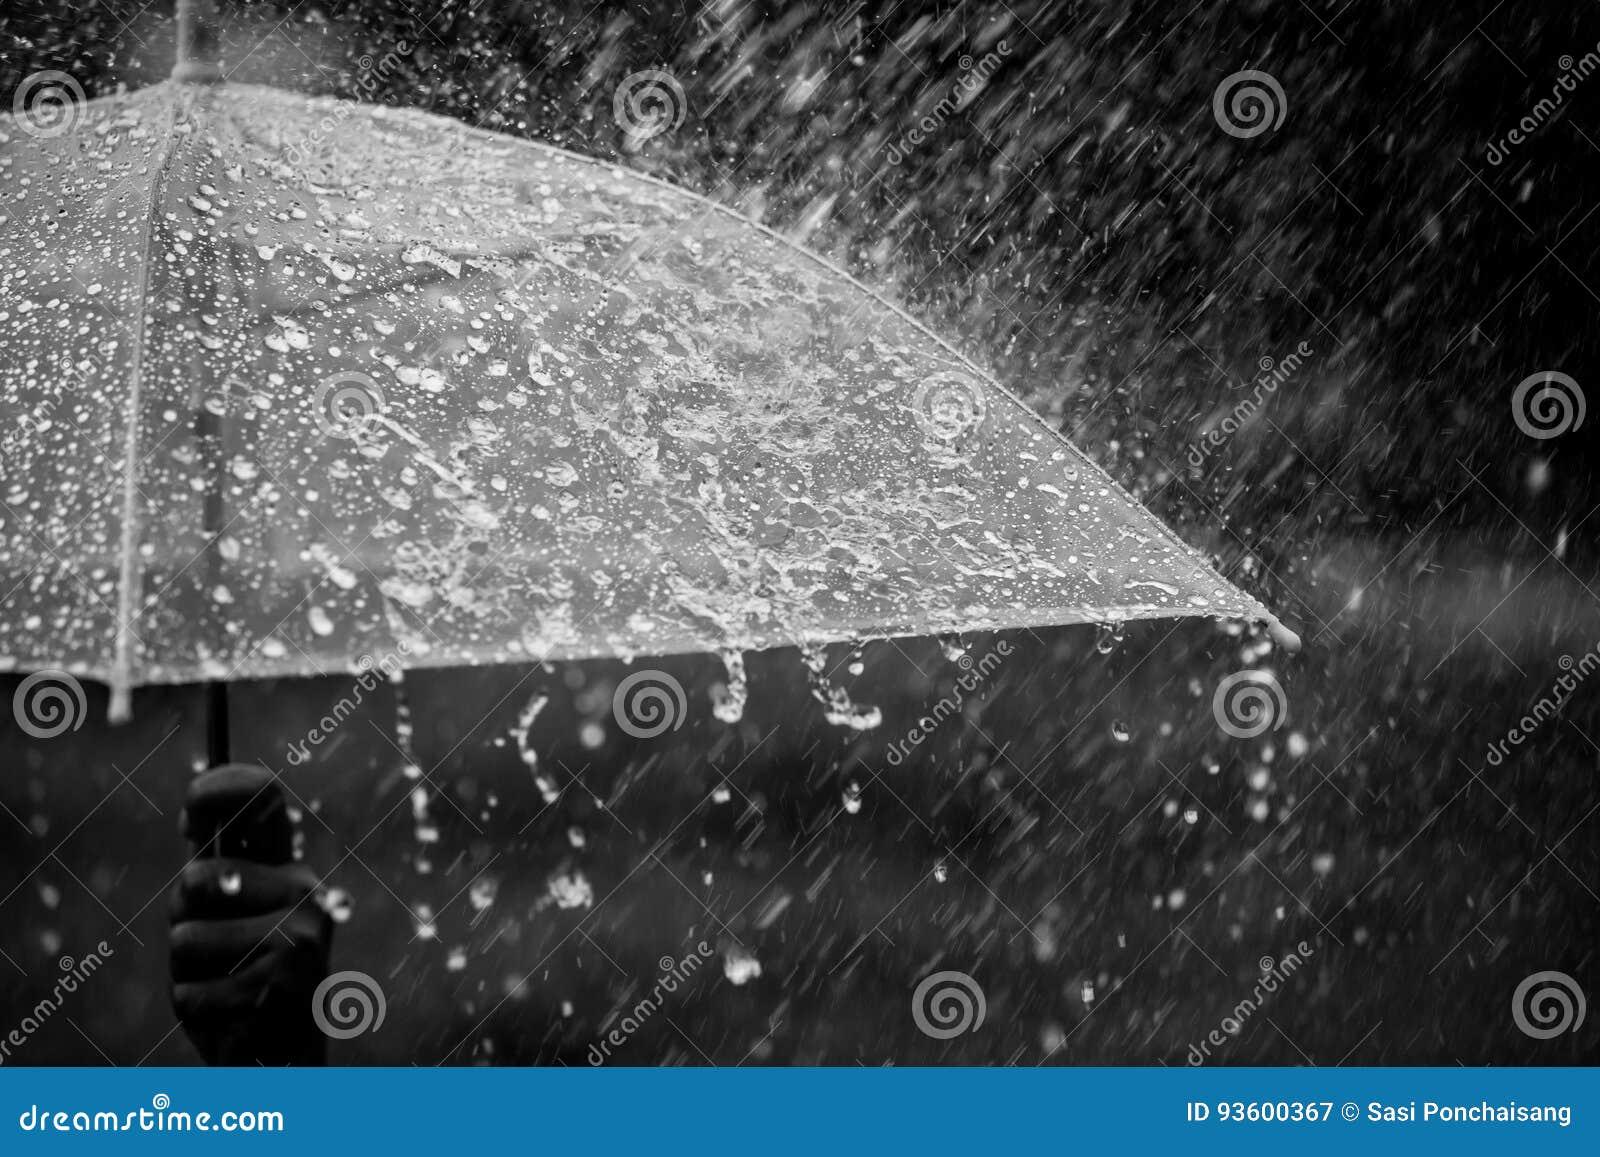 splashing water on umbrella in the rain stock image image of drop